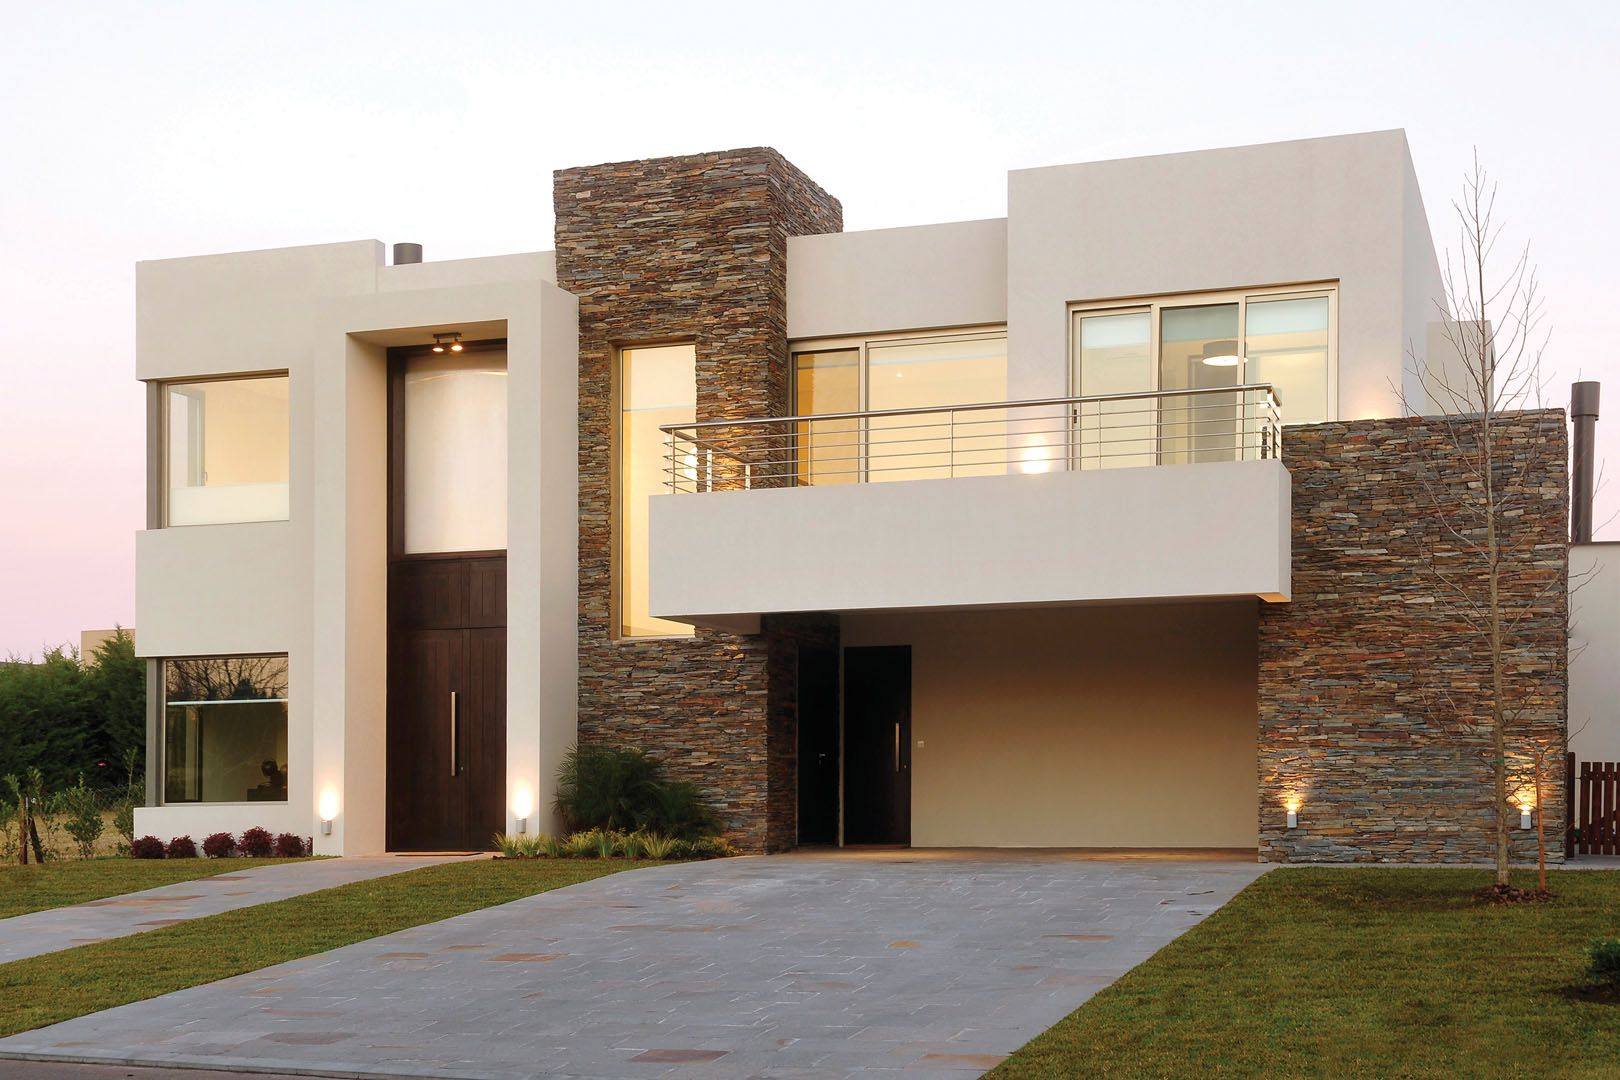 Fern ndez borda arquitectura fachadas puertas y piedras Pisos para exteriores de casas modernas